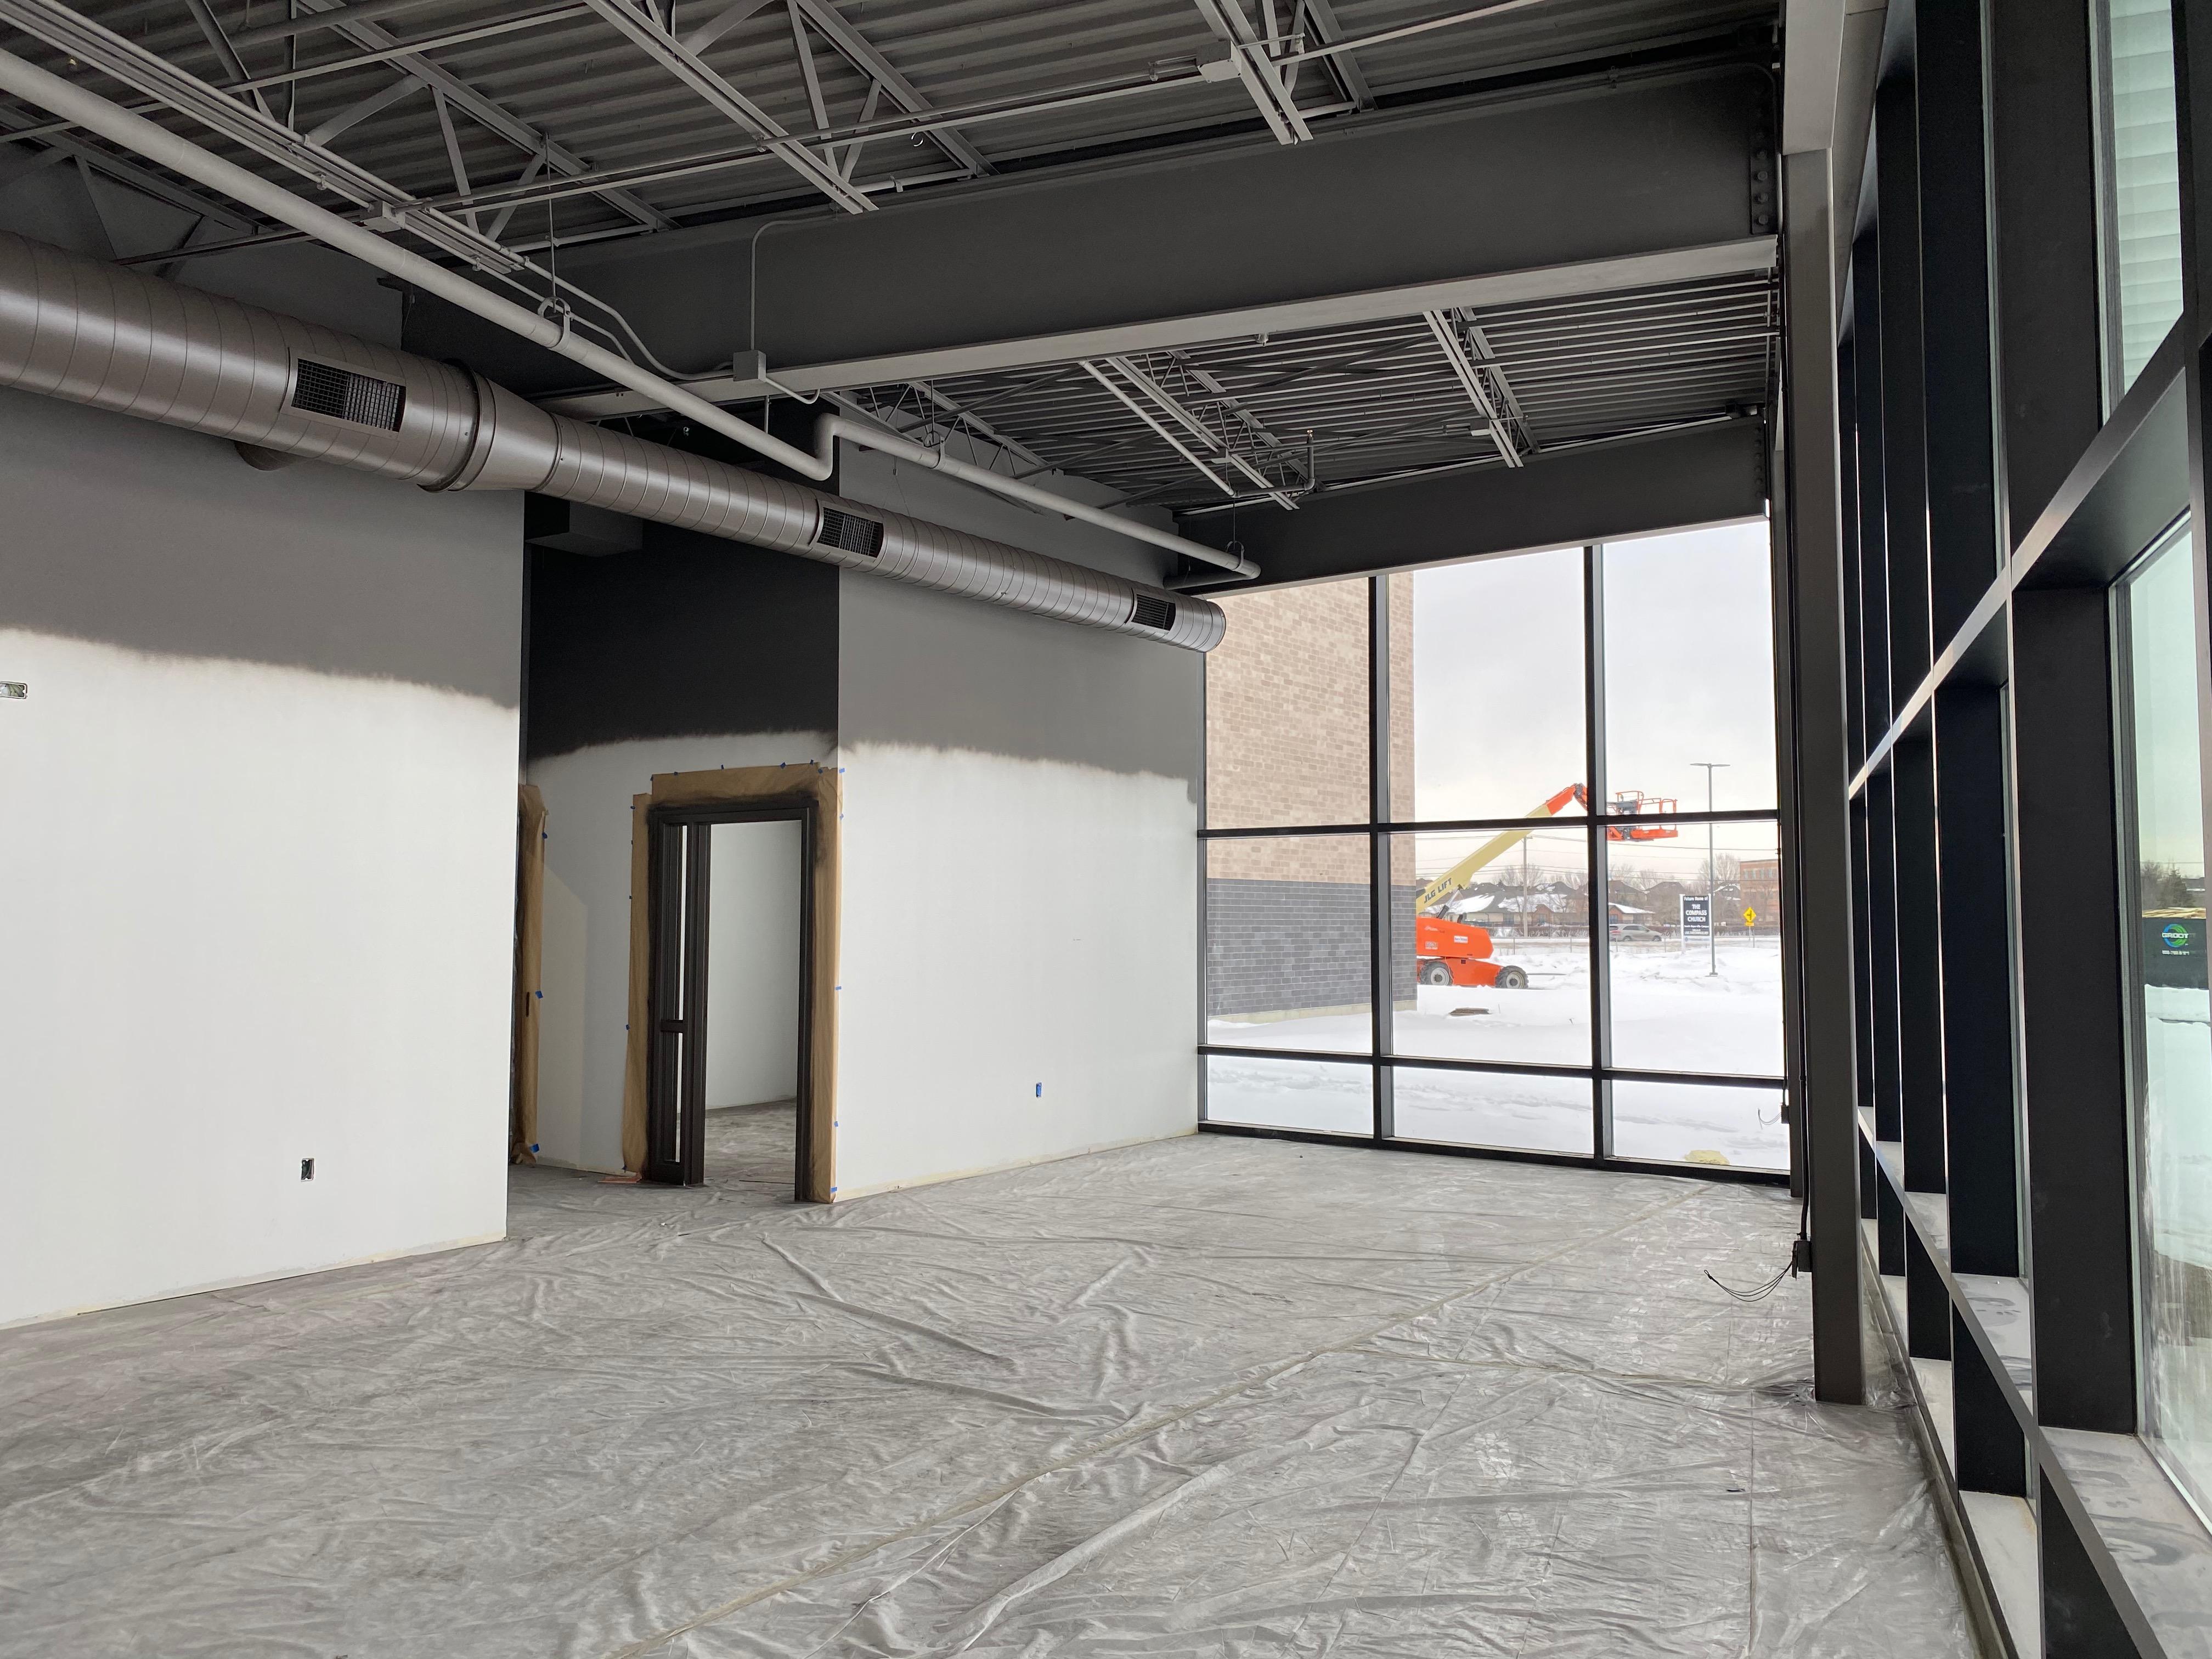 South Naperville Campus Construction 4